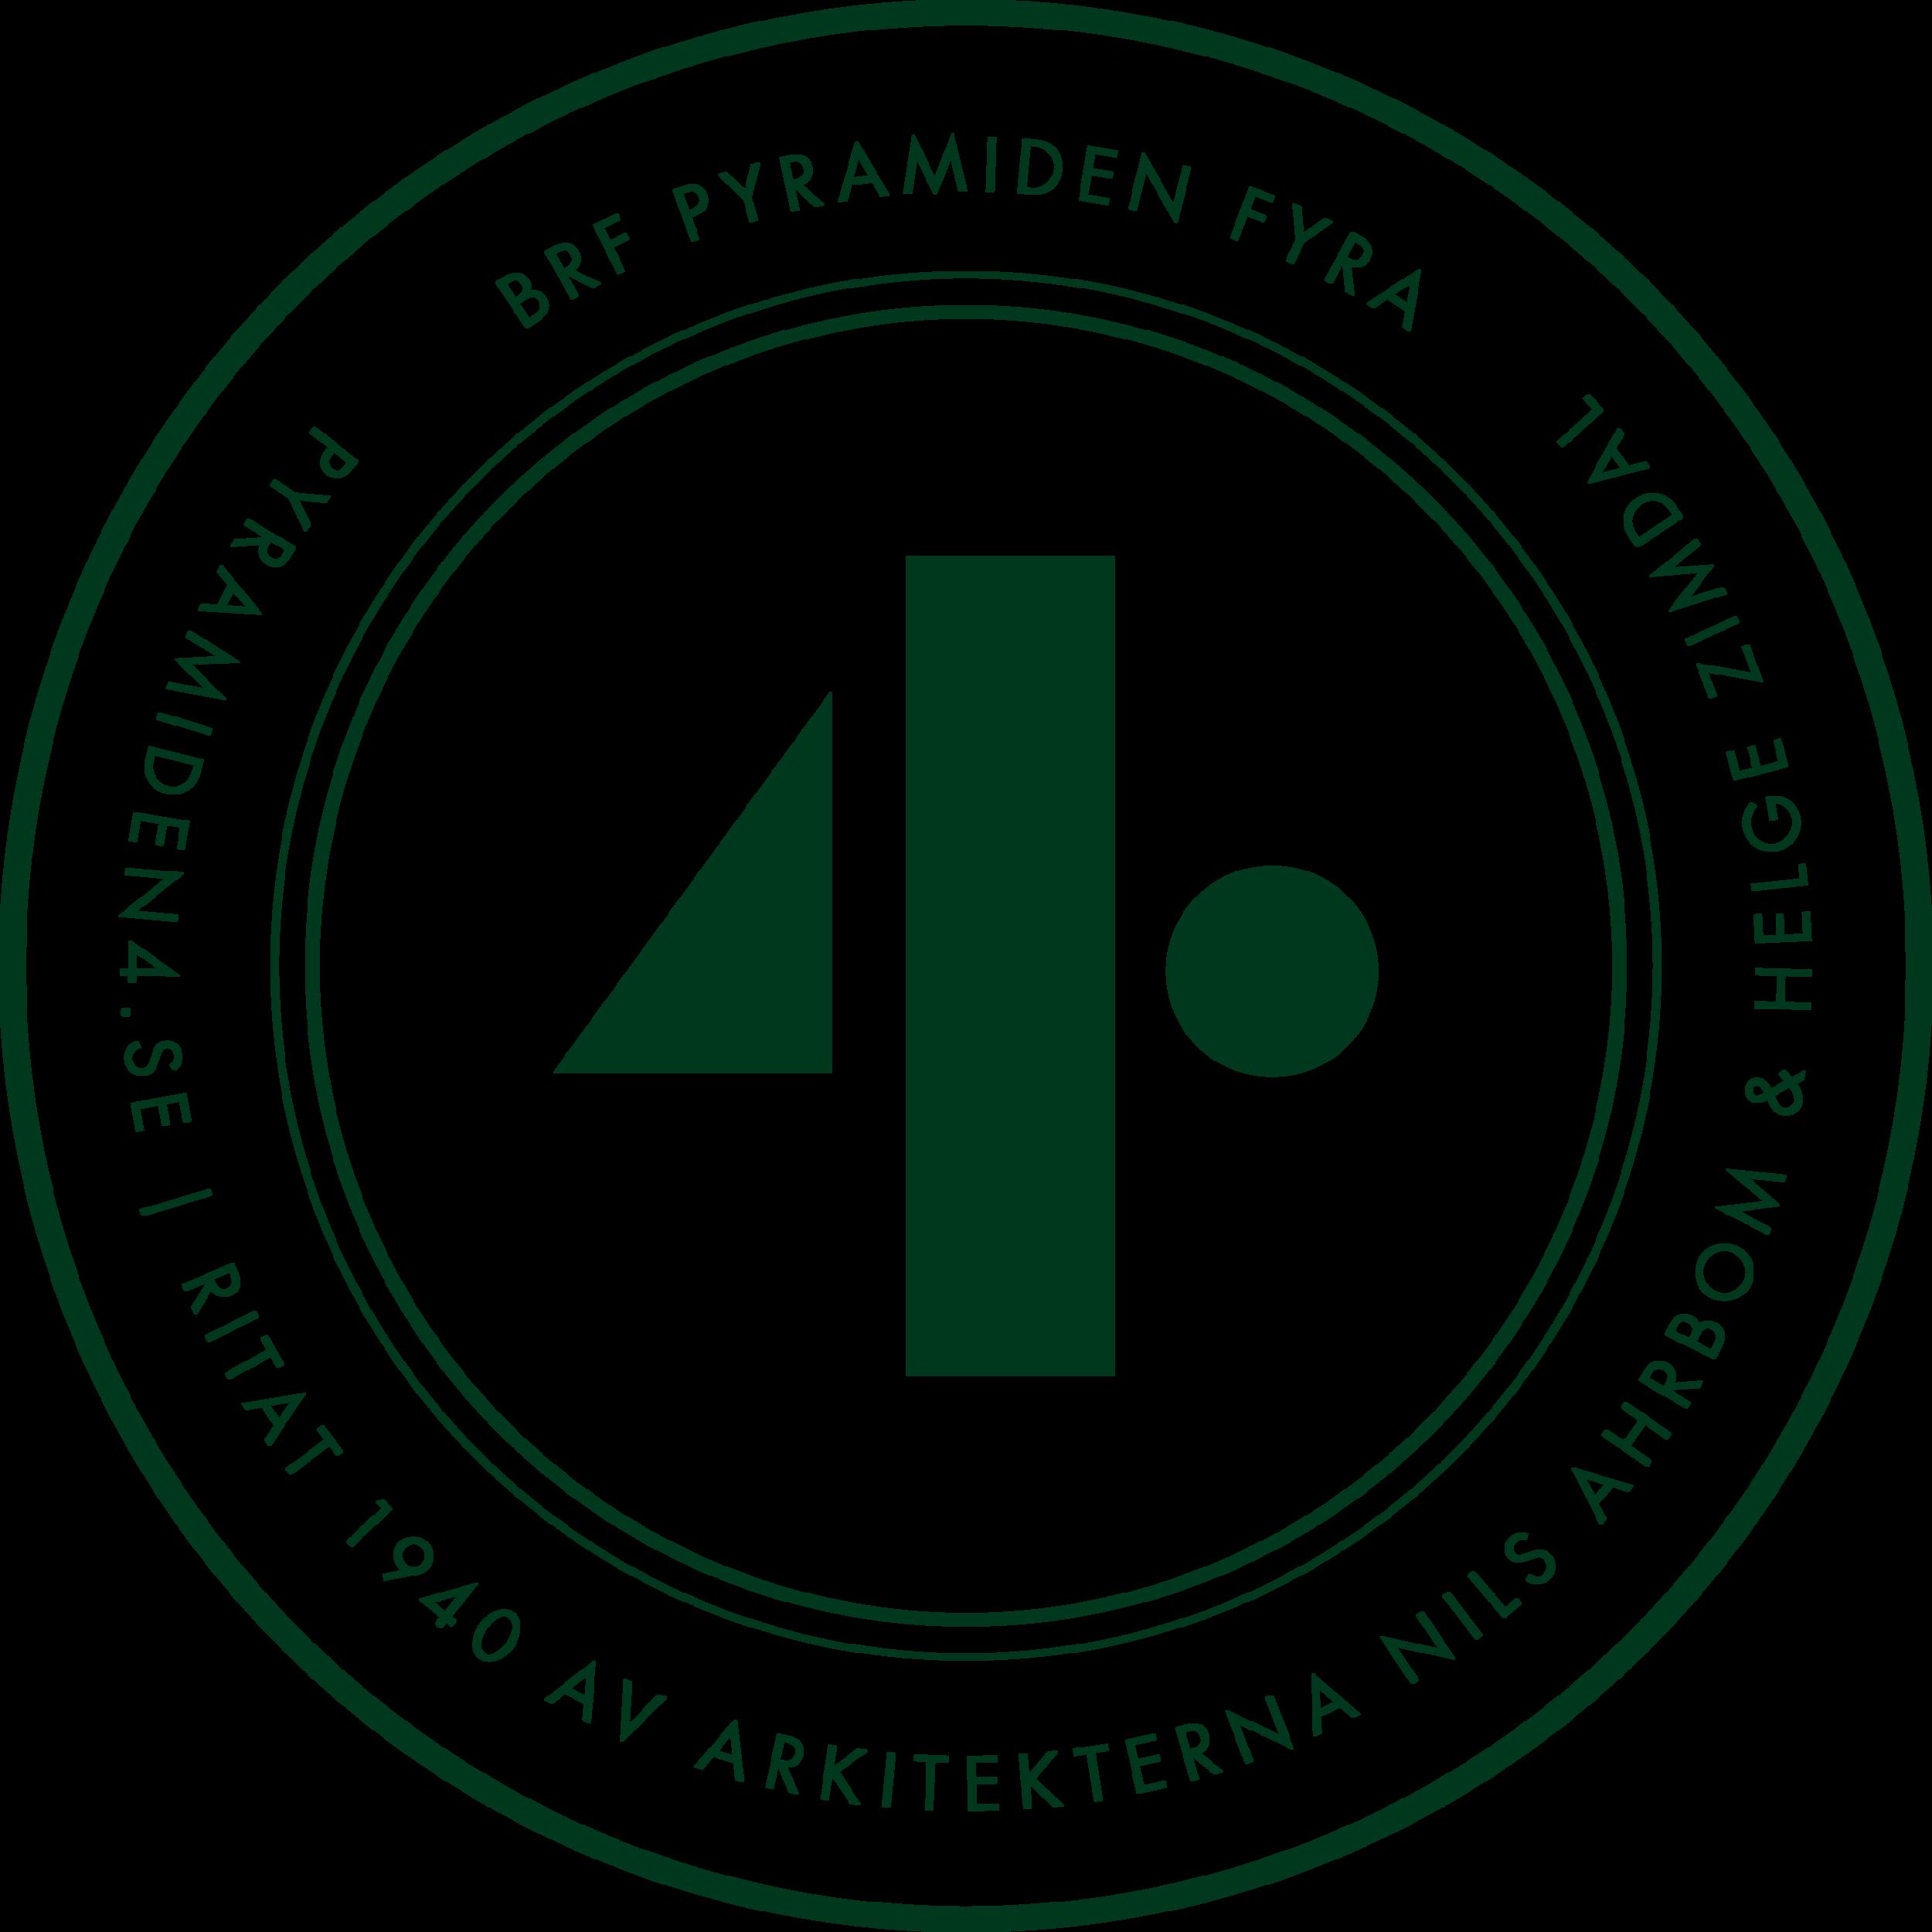 BRF Pyramiden 4_Symbol_Green.png